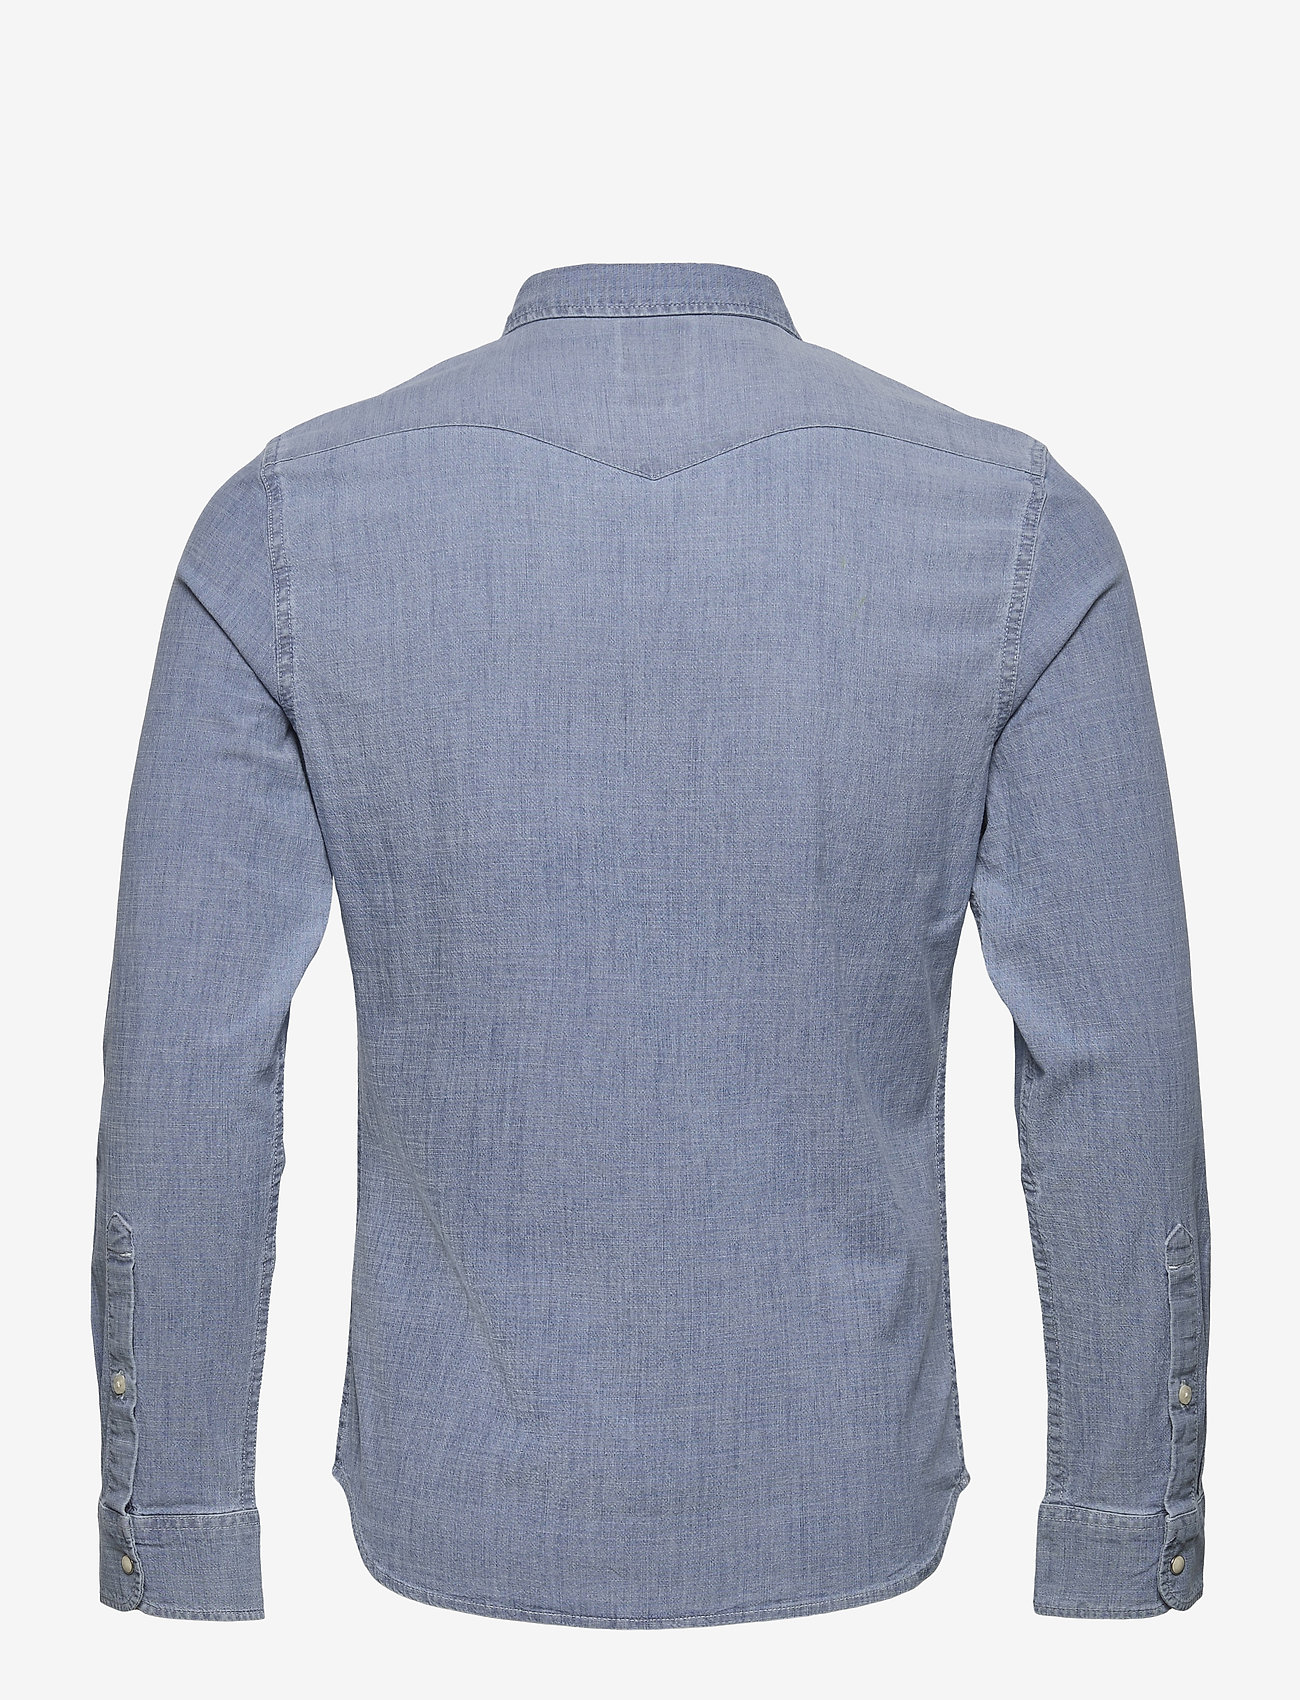 Lee Jeans - LEE WESTERN SHIRT - denim shirts - skyway blue - 1